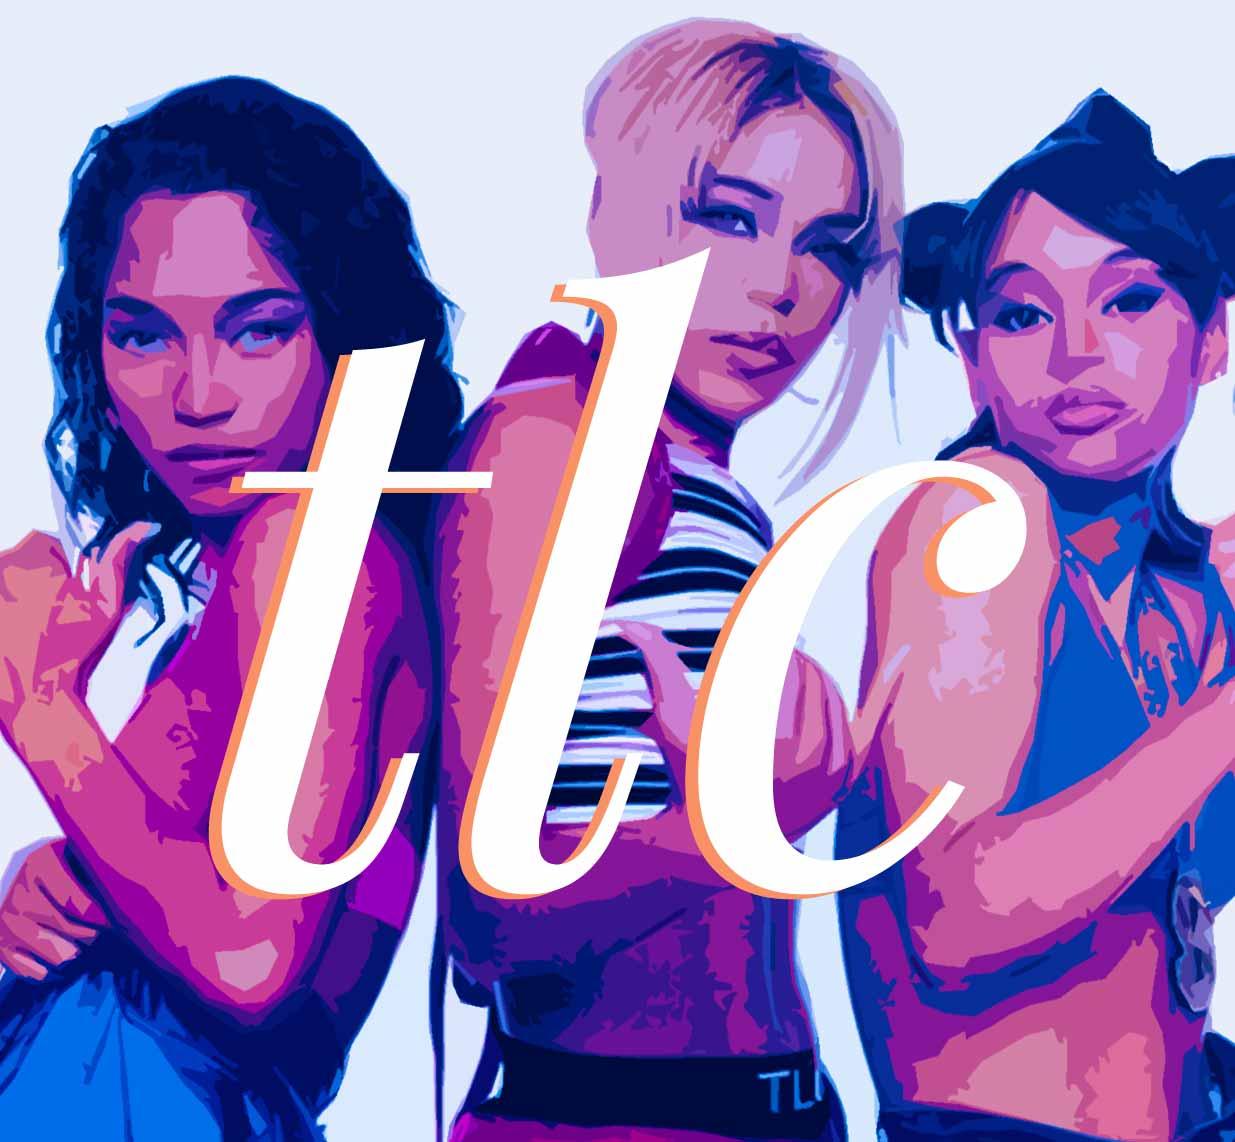 Untitled TLC documentary